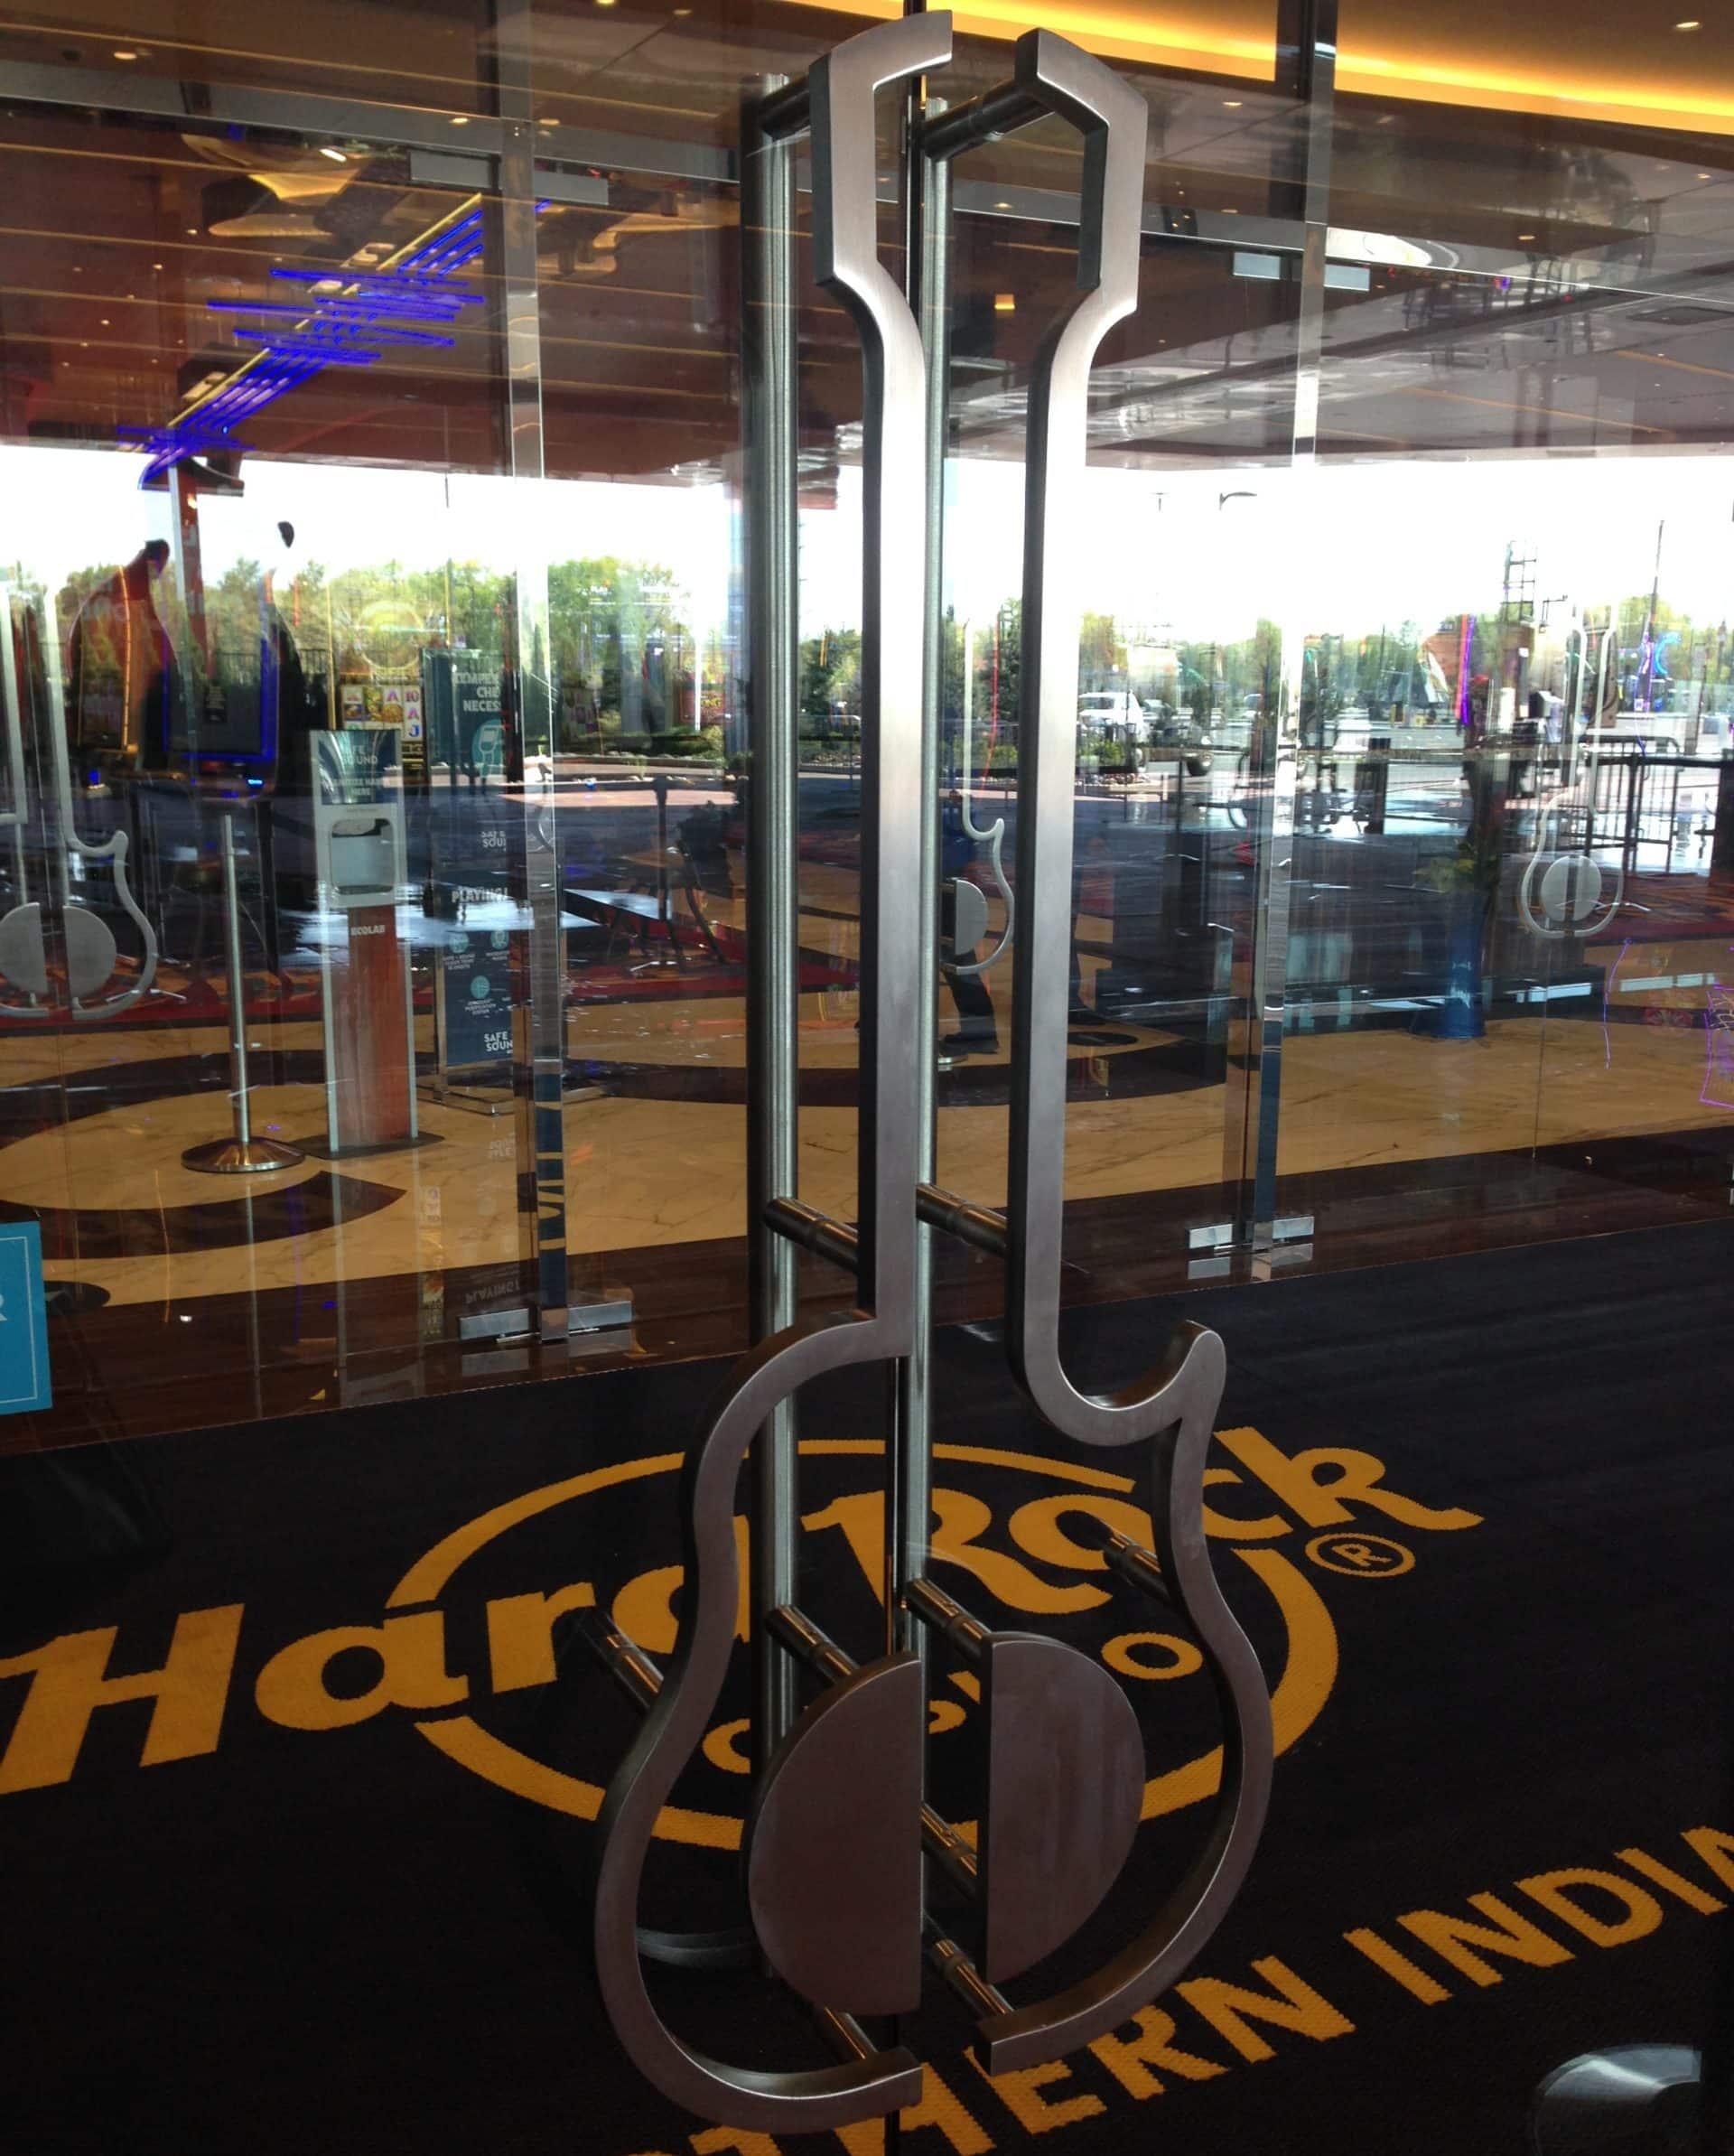 hard rock door handle opening photo scaled e1621520844477